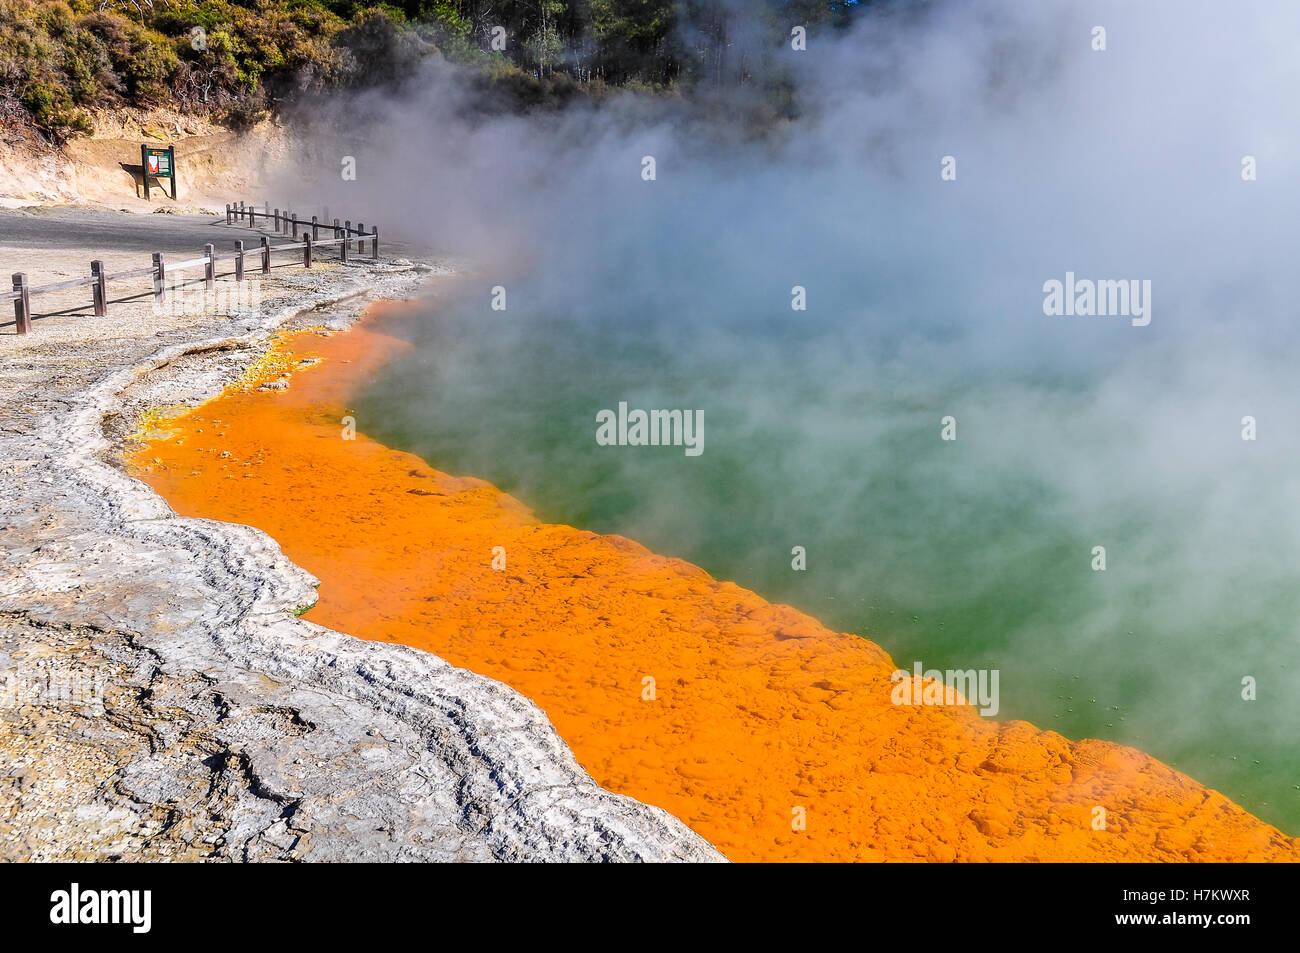 Champagne Pool in the wonderland of the Wai-o-tapu geothermal area, near Rotorua, New Zealand - Stock Image